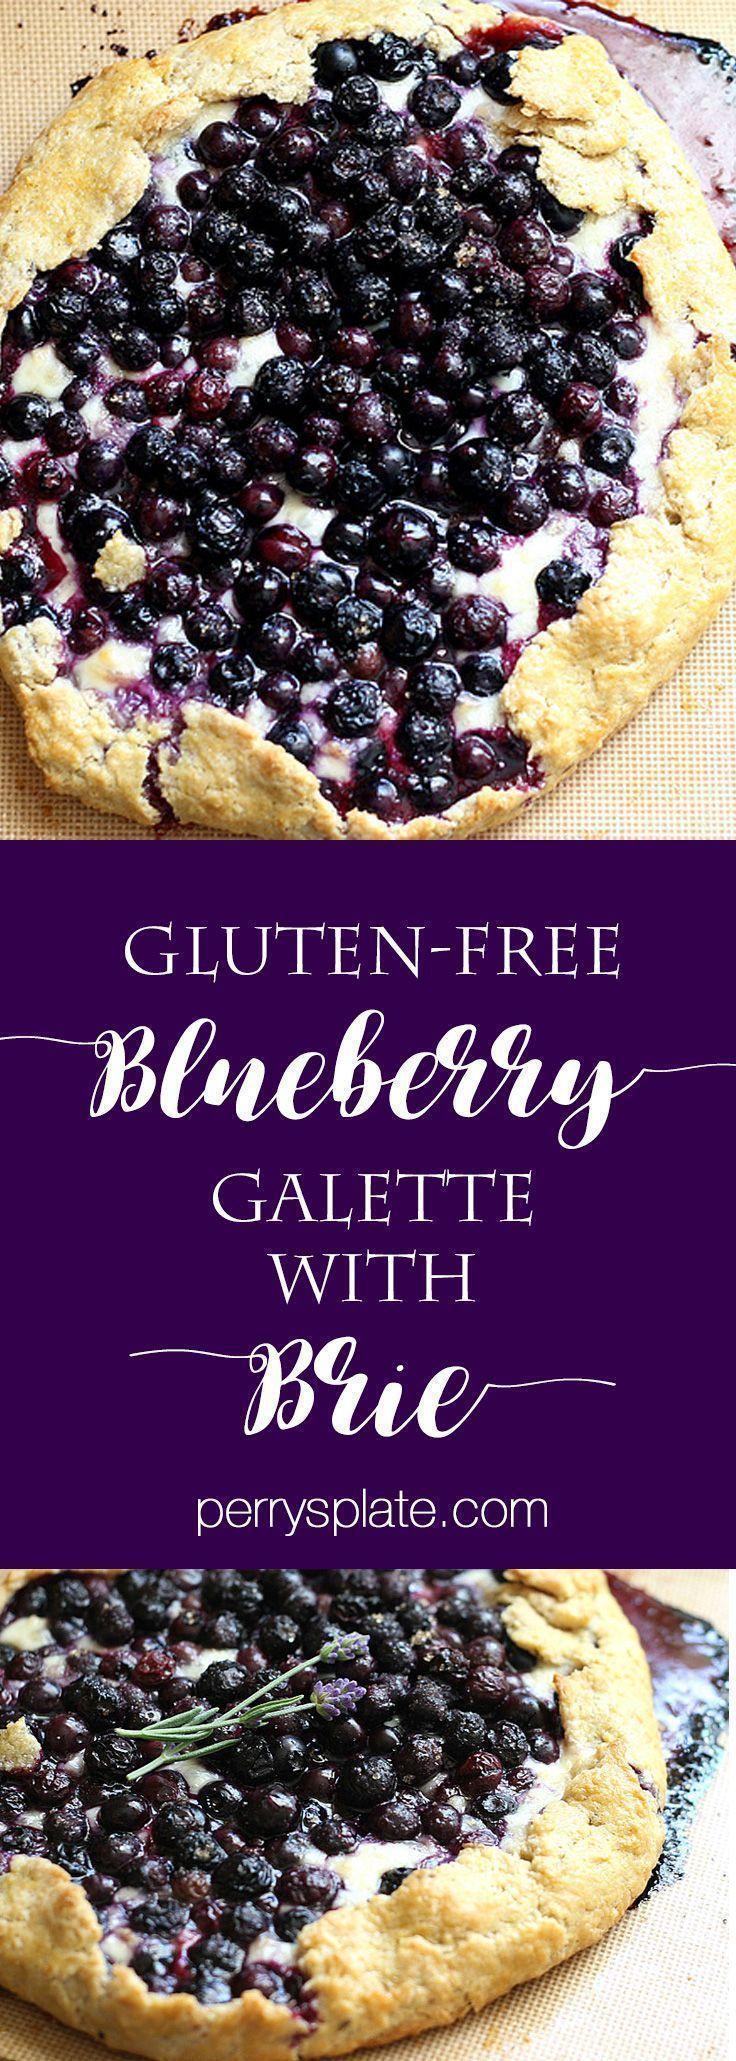 Gluten Free Blueberry Galette With Brie Galette Recipes Gluten